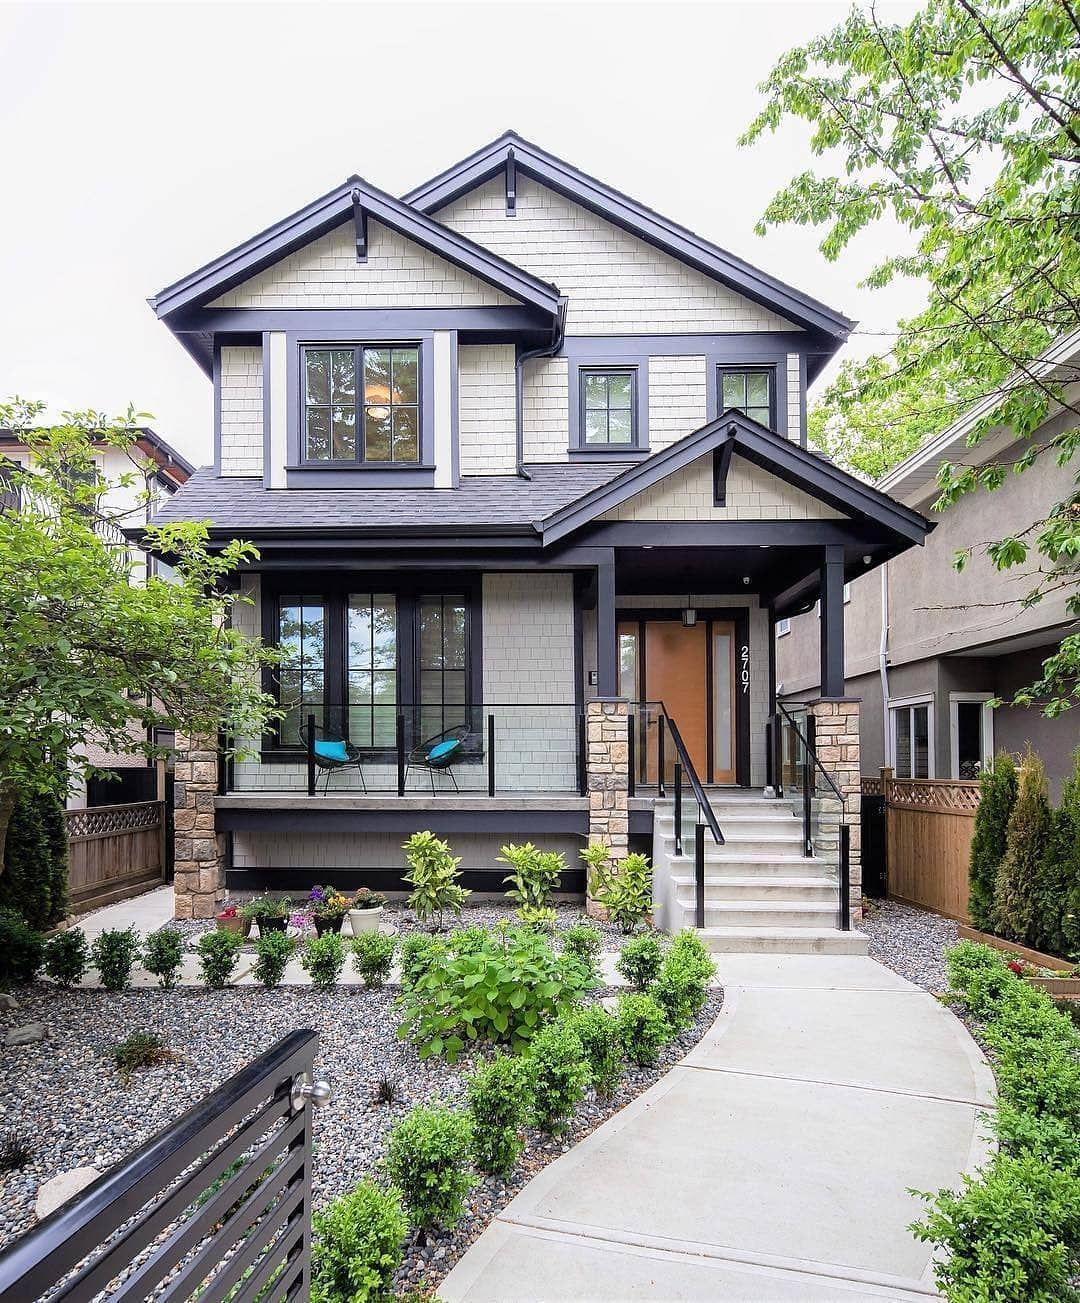 New The 10 Best Home Decor With Pictures Selamat Pagiii Semua Ayo Bangun Semoga Pagi Ini Menam House Exterior House Designs Exterior Dream House Exterior